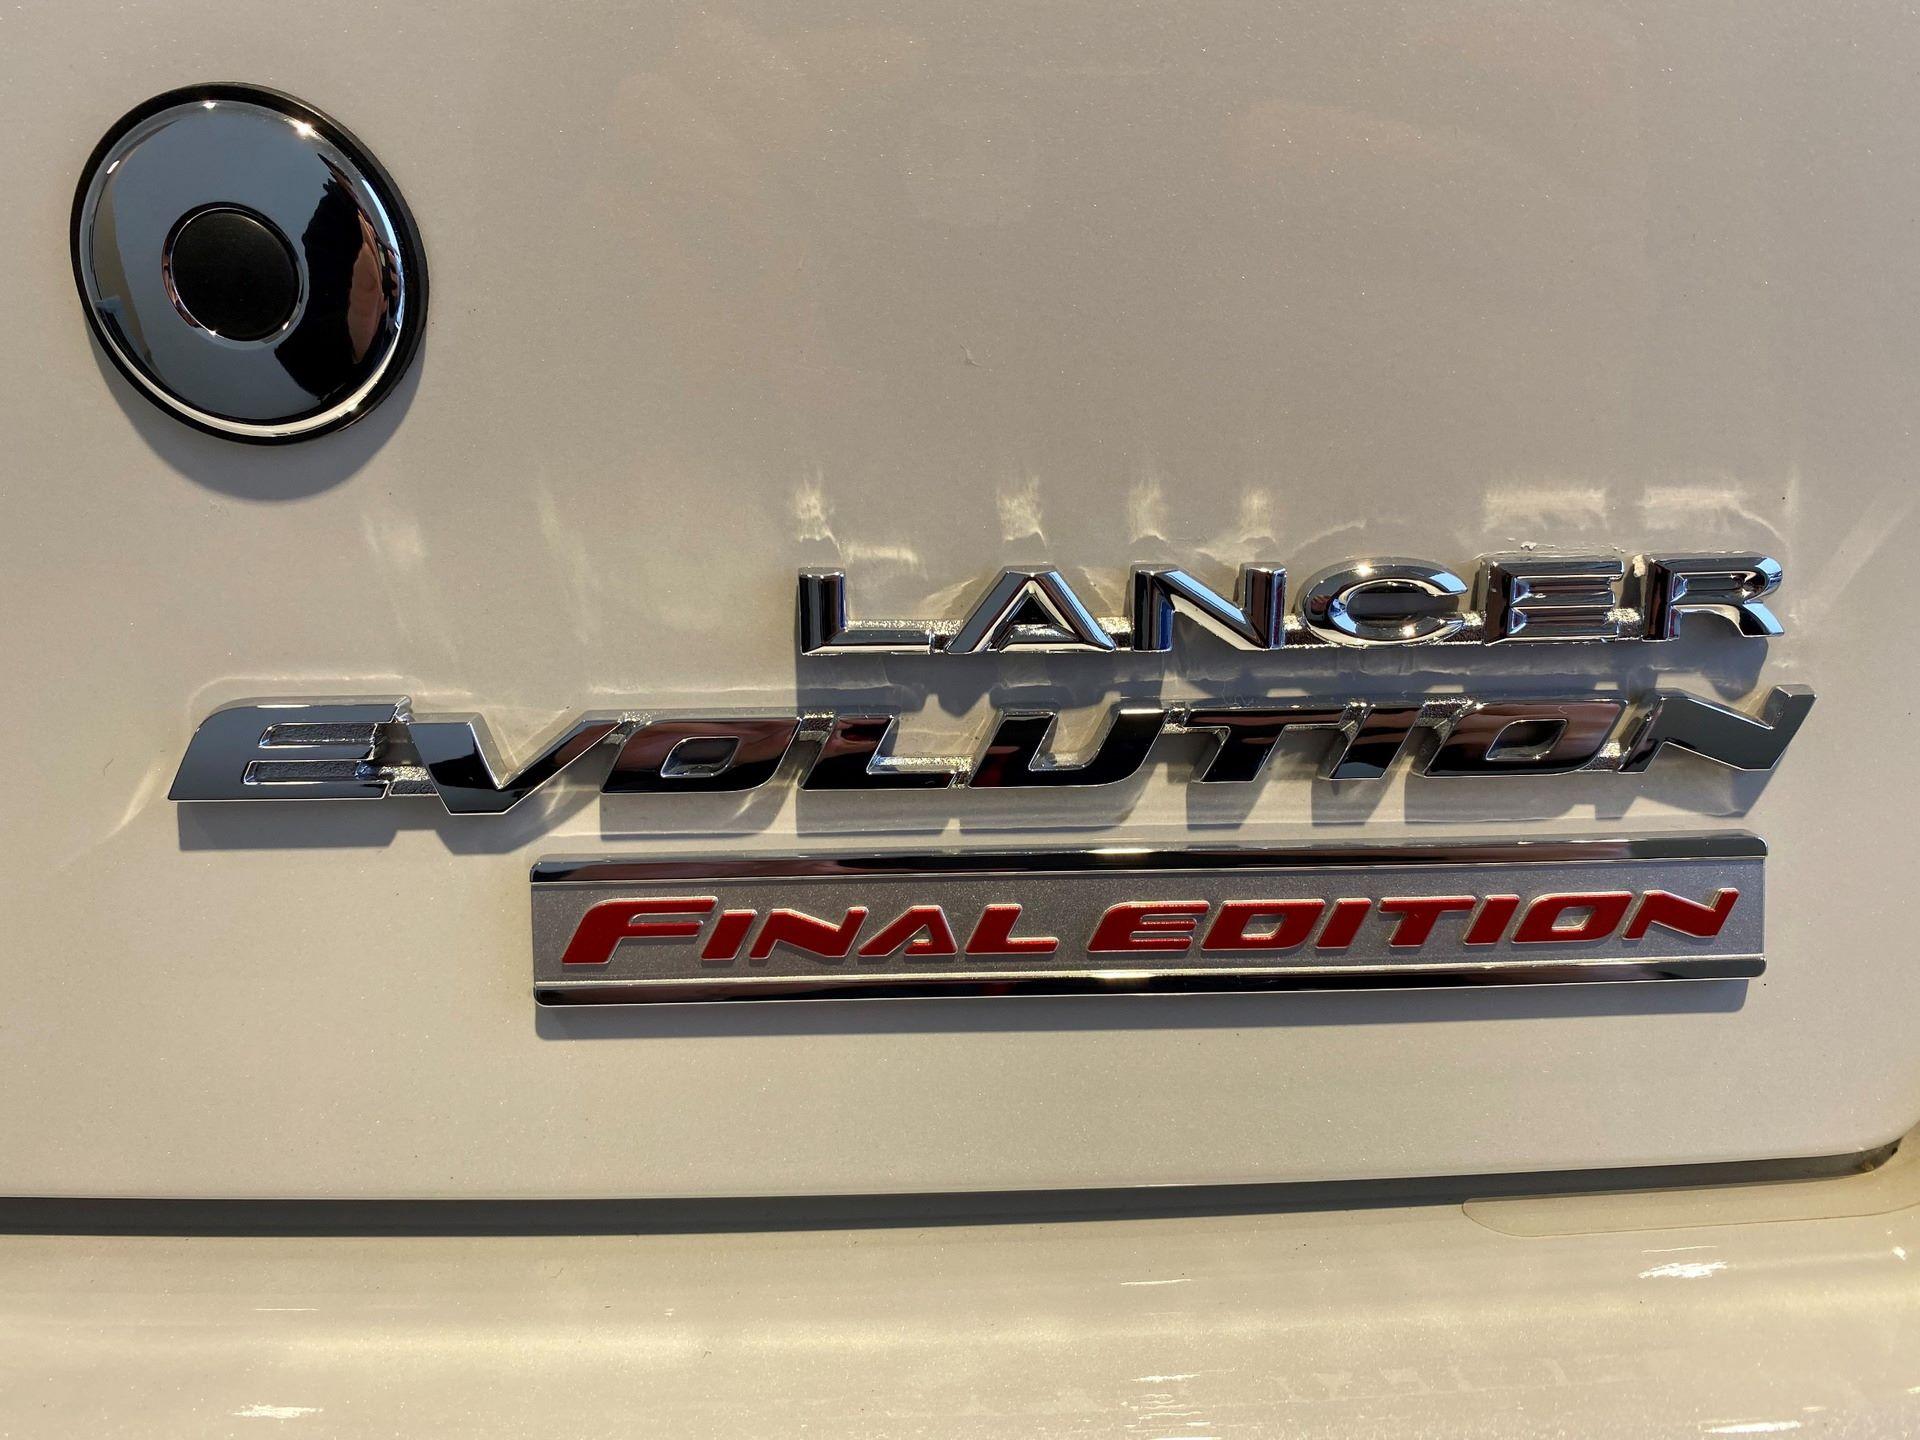 Mitsubishi-Lancer-Evo-Final-Edition-for-sale-7